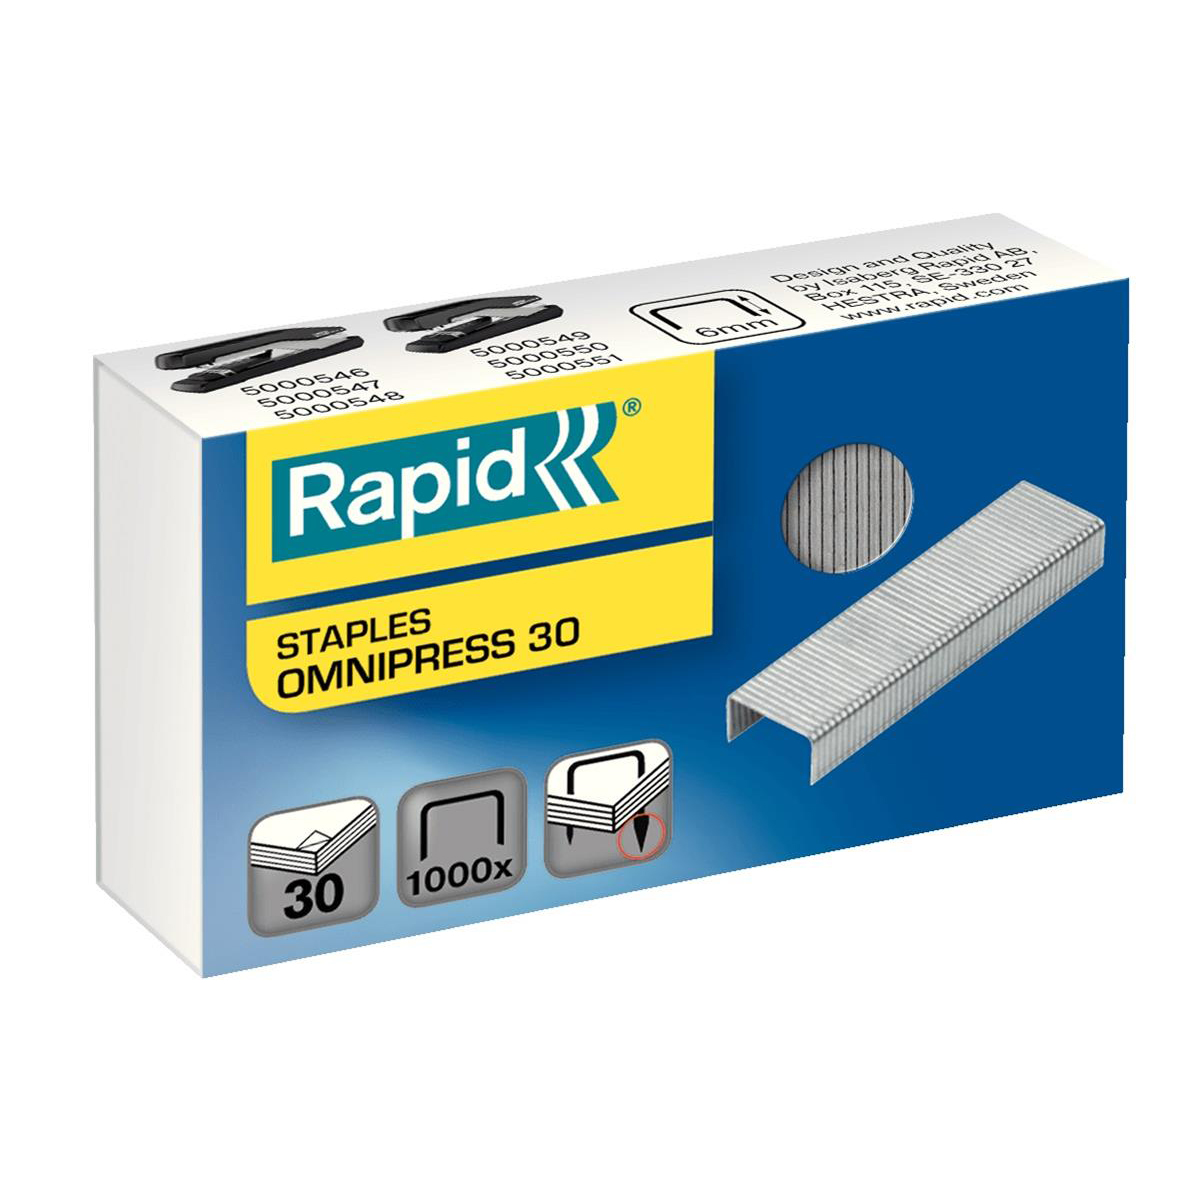 Rapid Omnipress 30 Staples 6mm Ref 5000559 Box of 1000